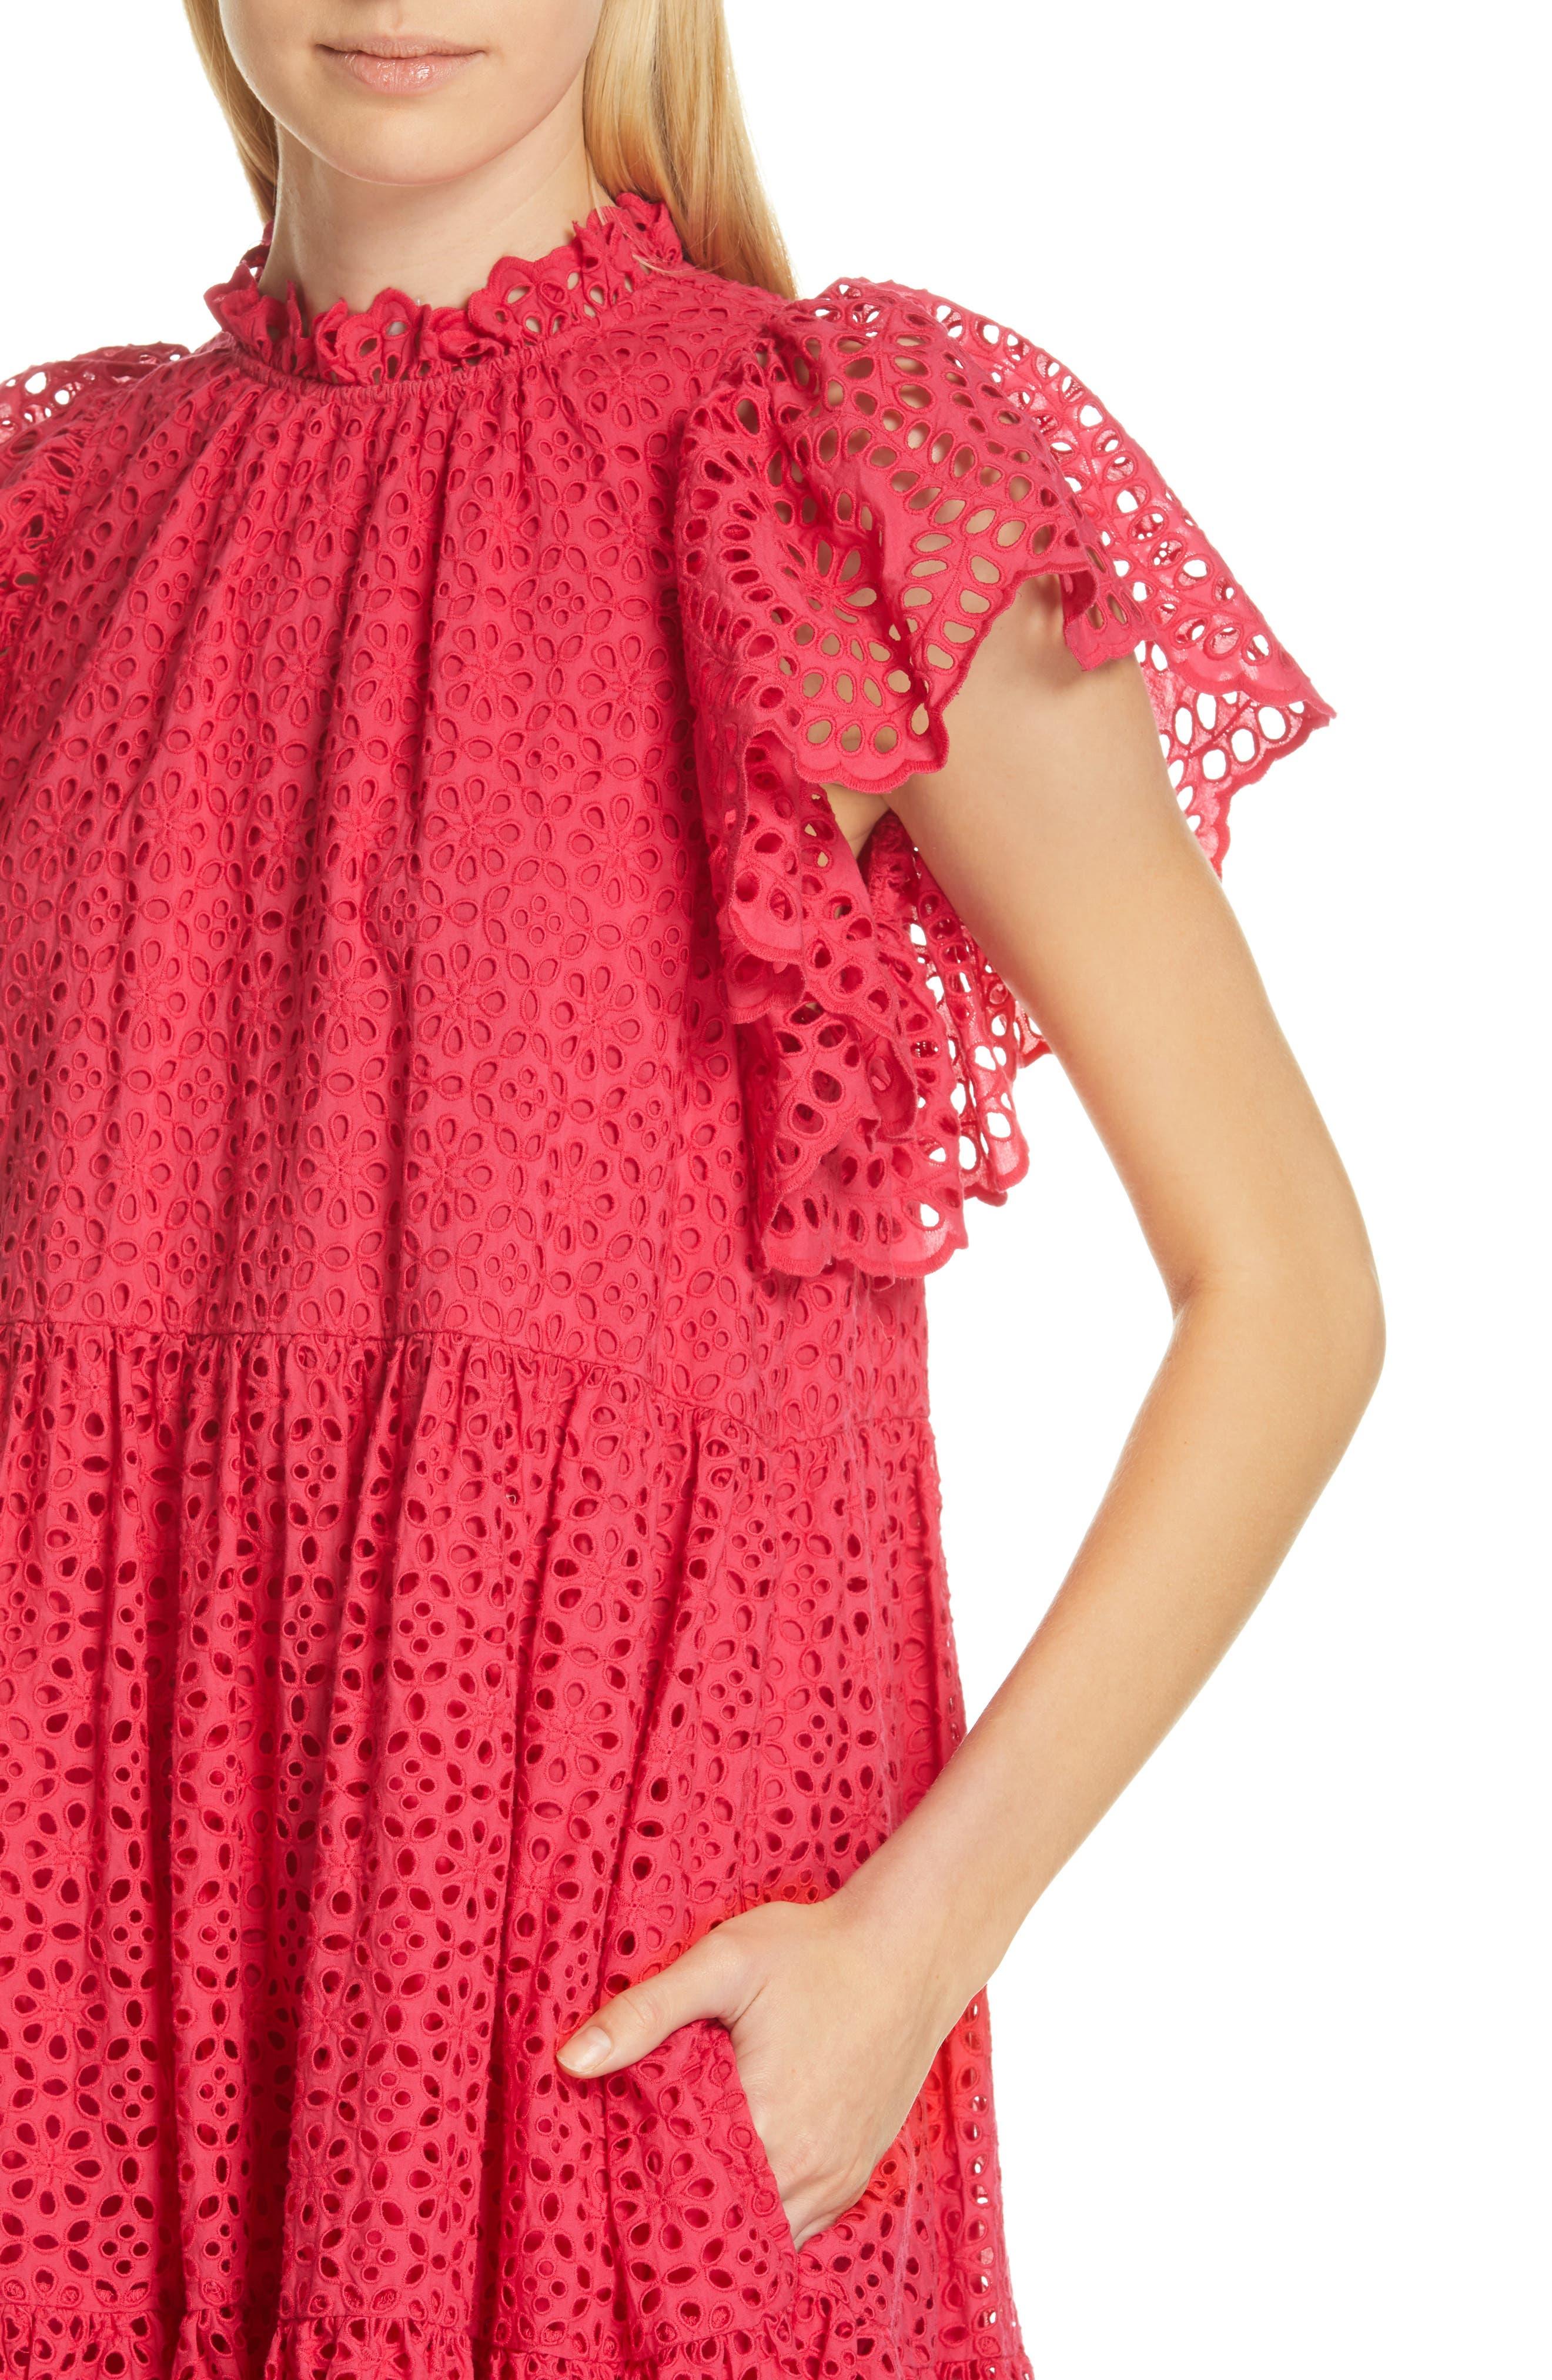 ULLA JOHNSON, Norah Eyelet Dress, Alternate thumbnail 5, color, FUCHSIA